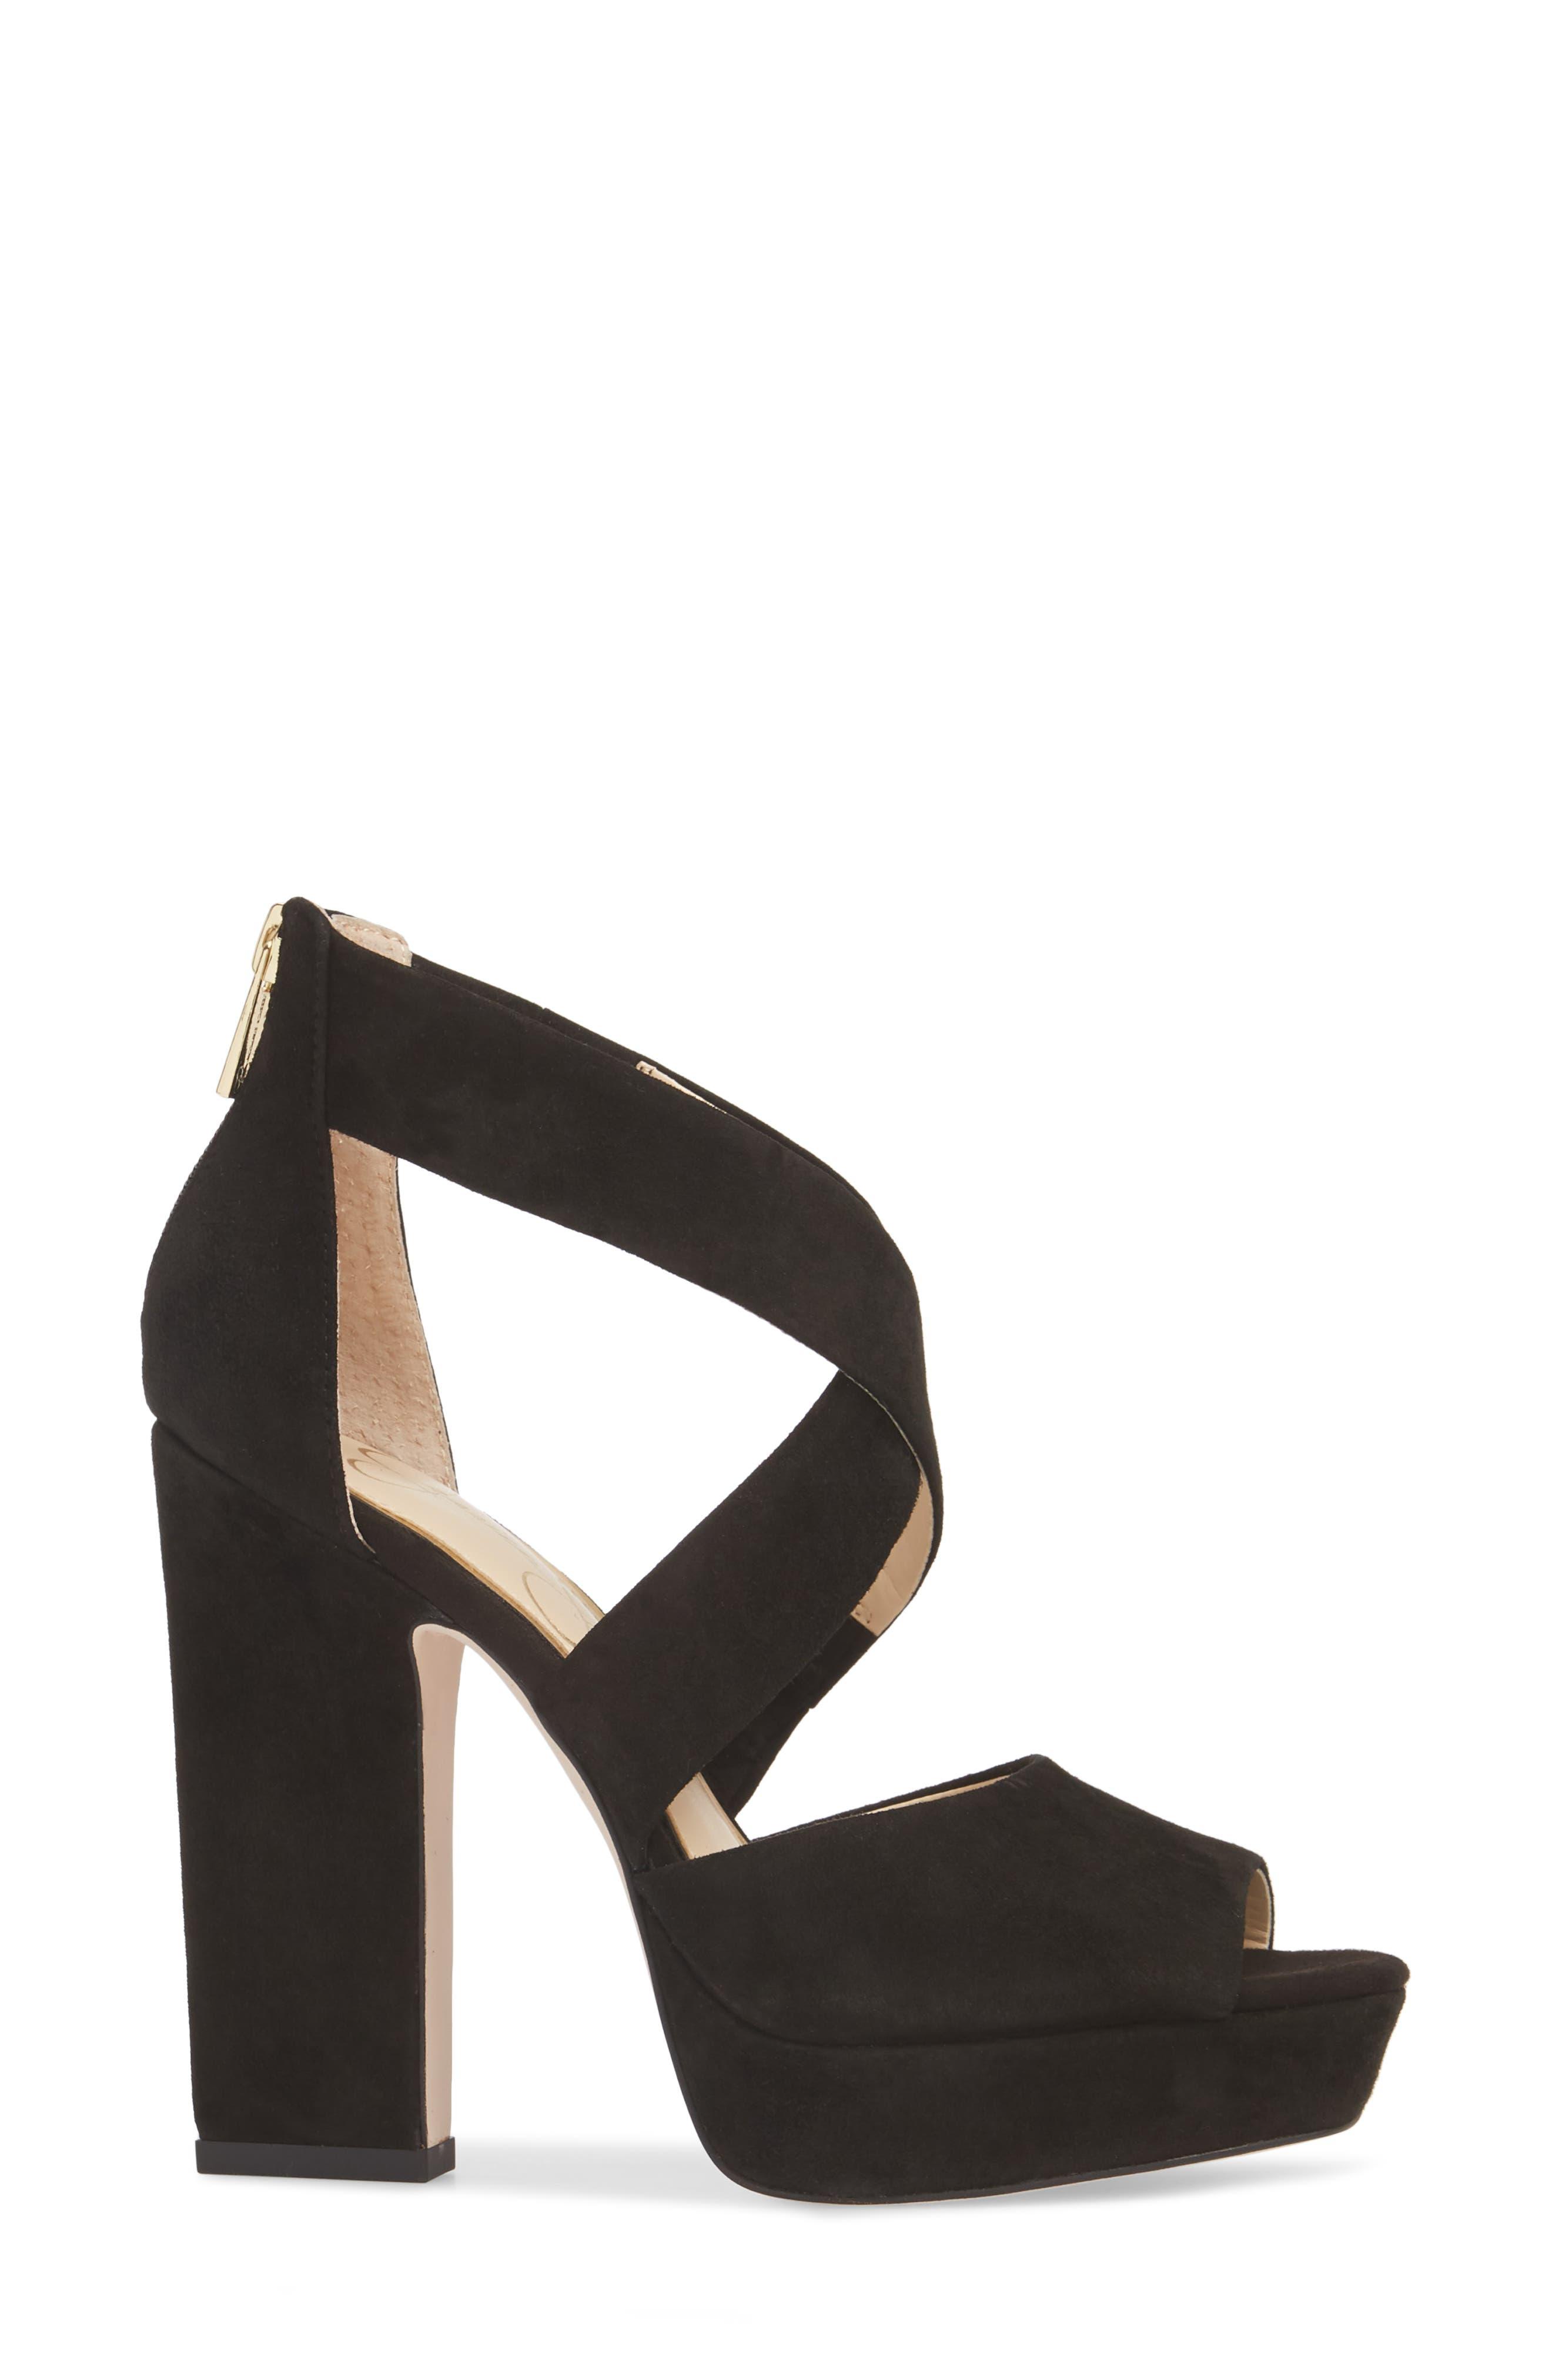 Tehya Cross Strap Platform Sandal,                             Alternate thumbnail 3, color,                             001